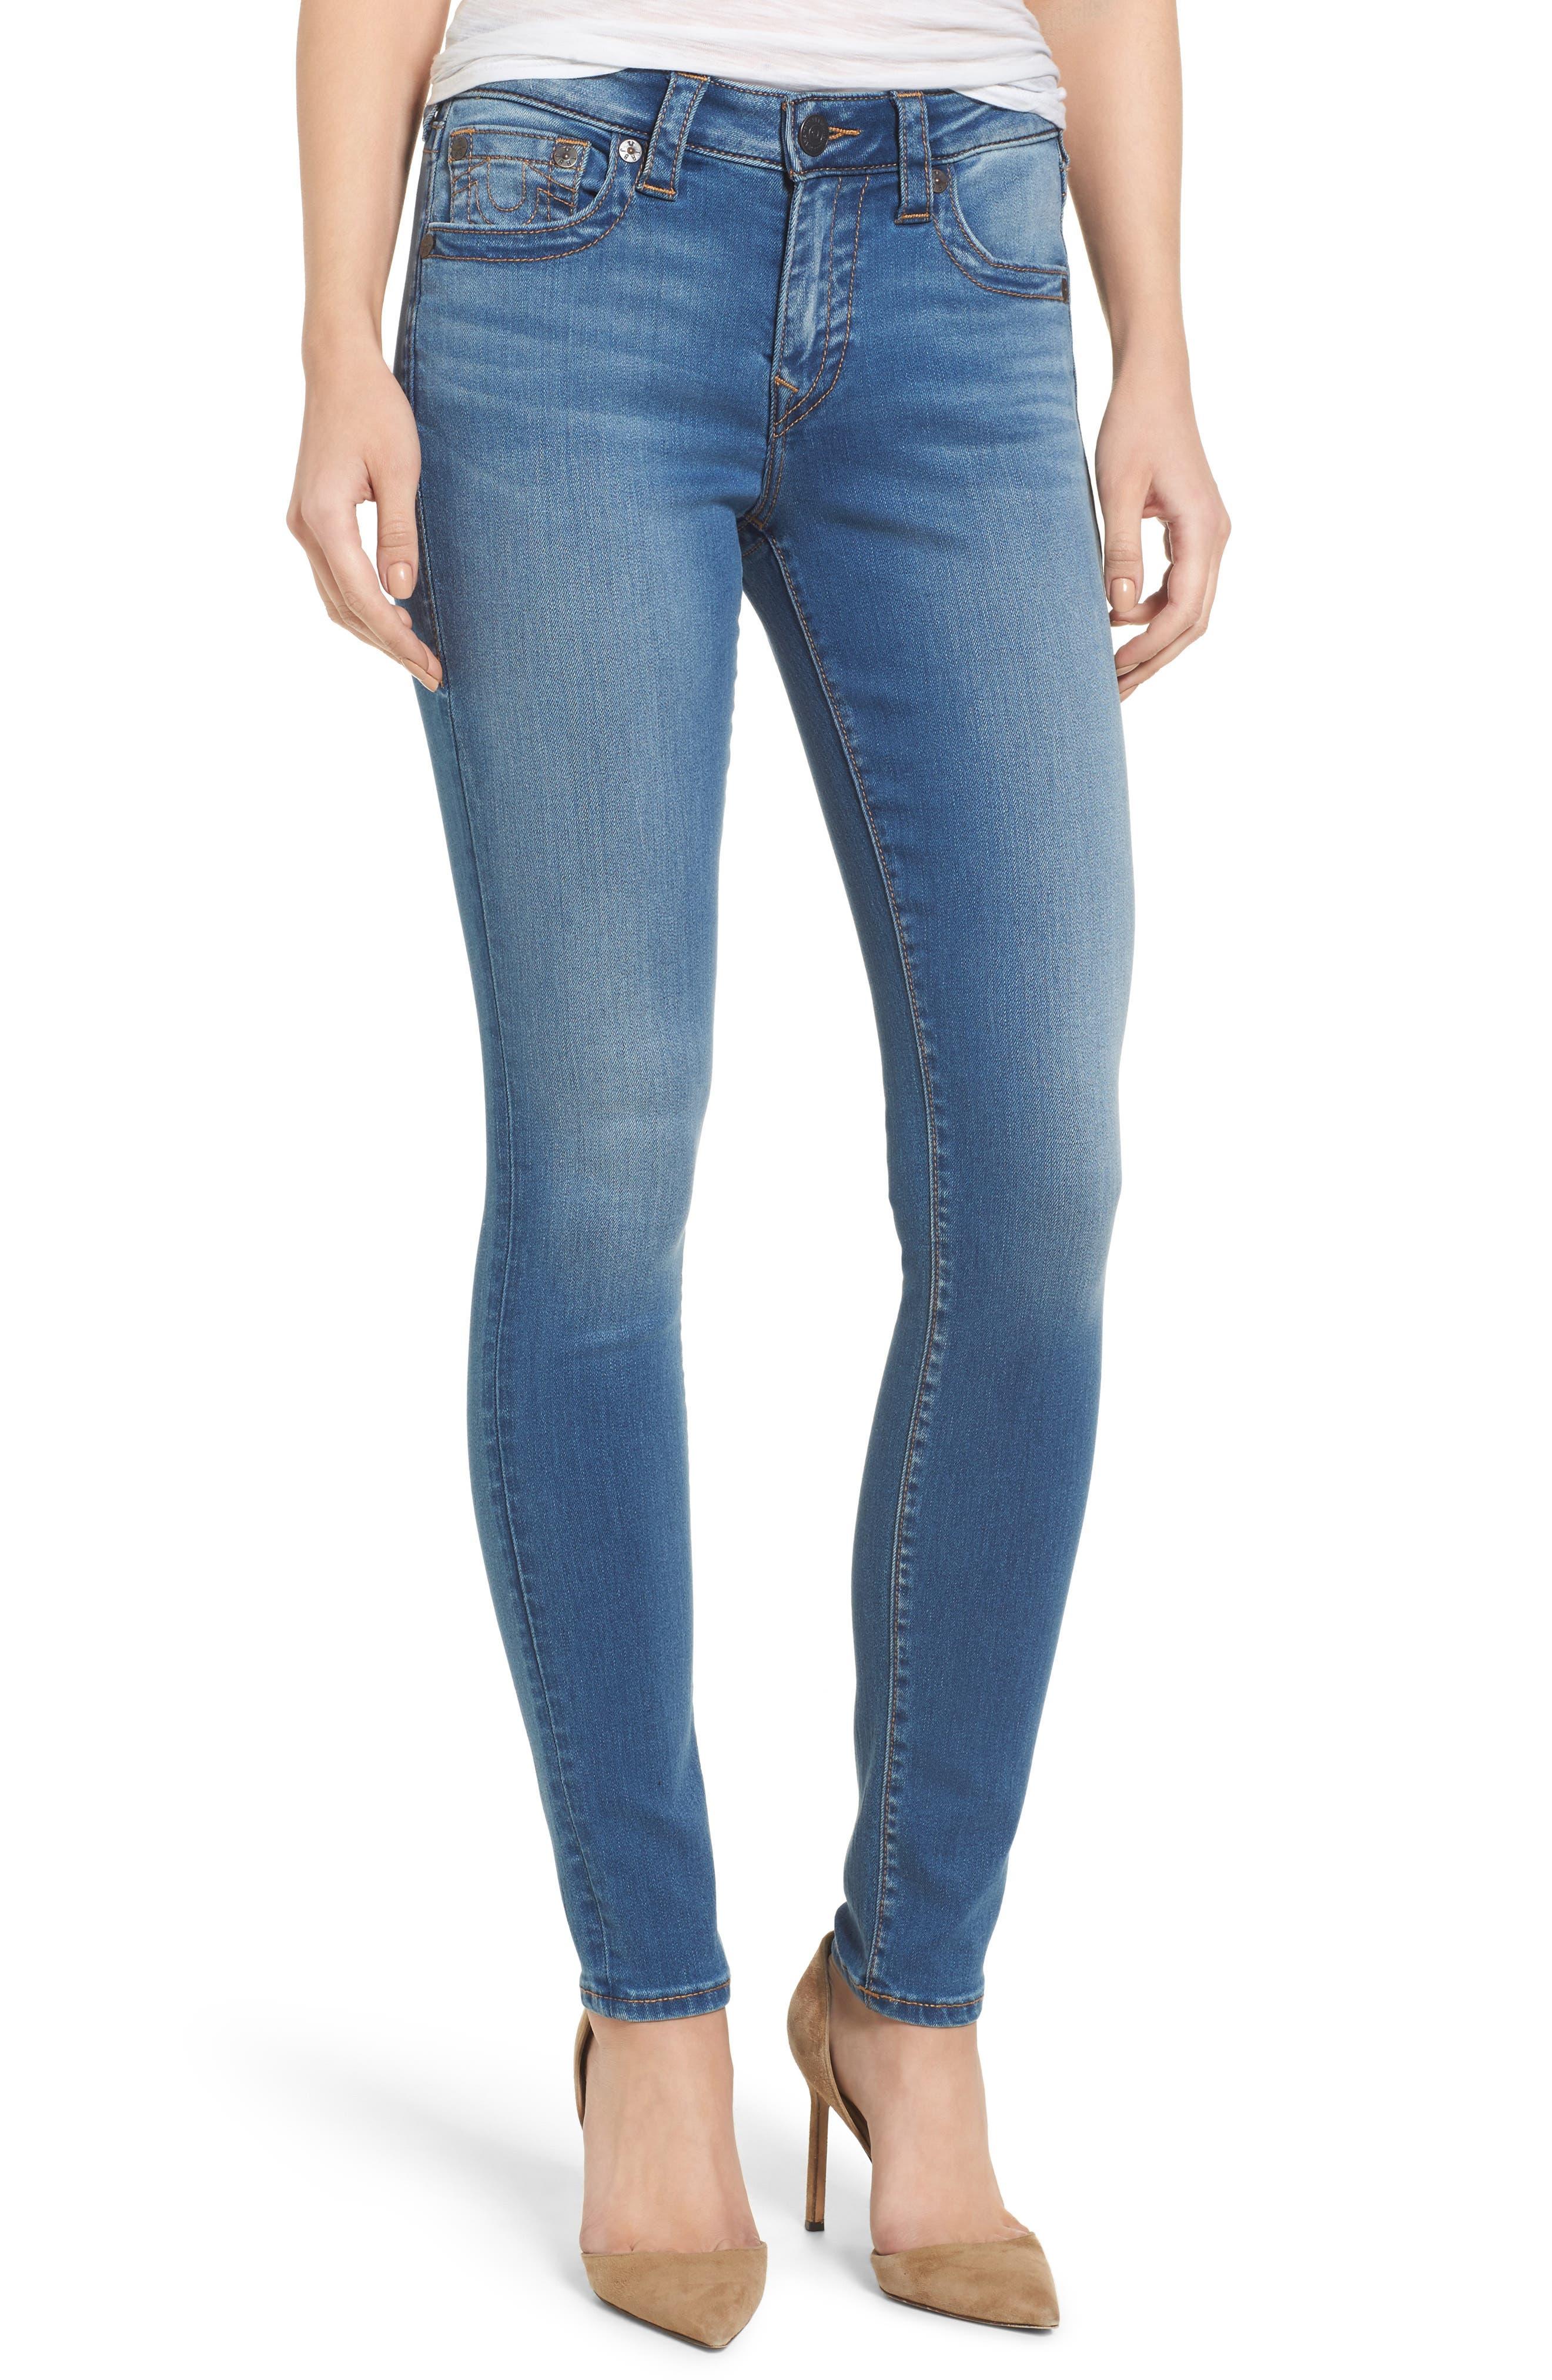 Jennie Curvy Skinny Jeans,                         Main,                         color, Nu Authentic Indigo